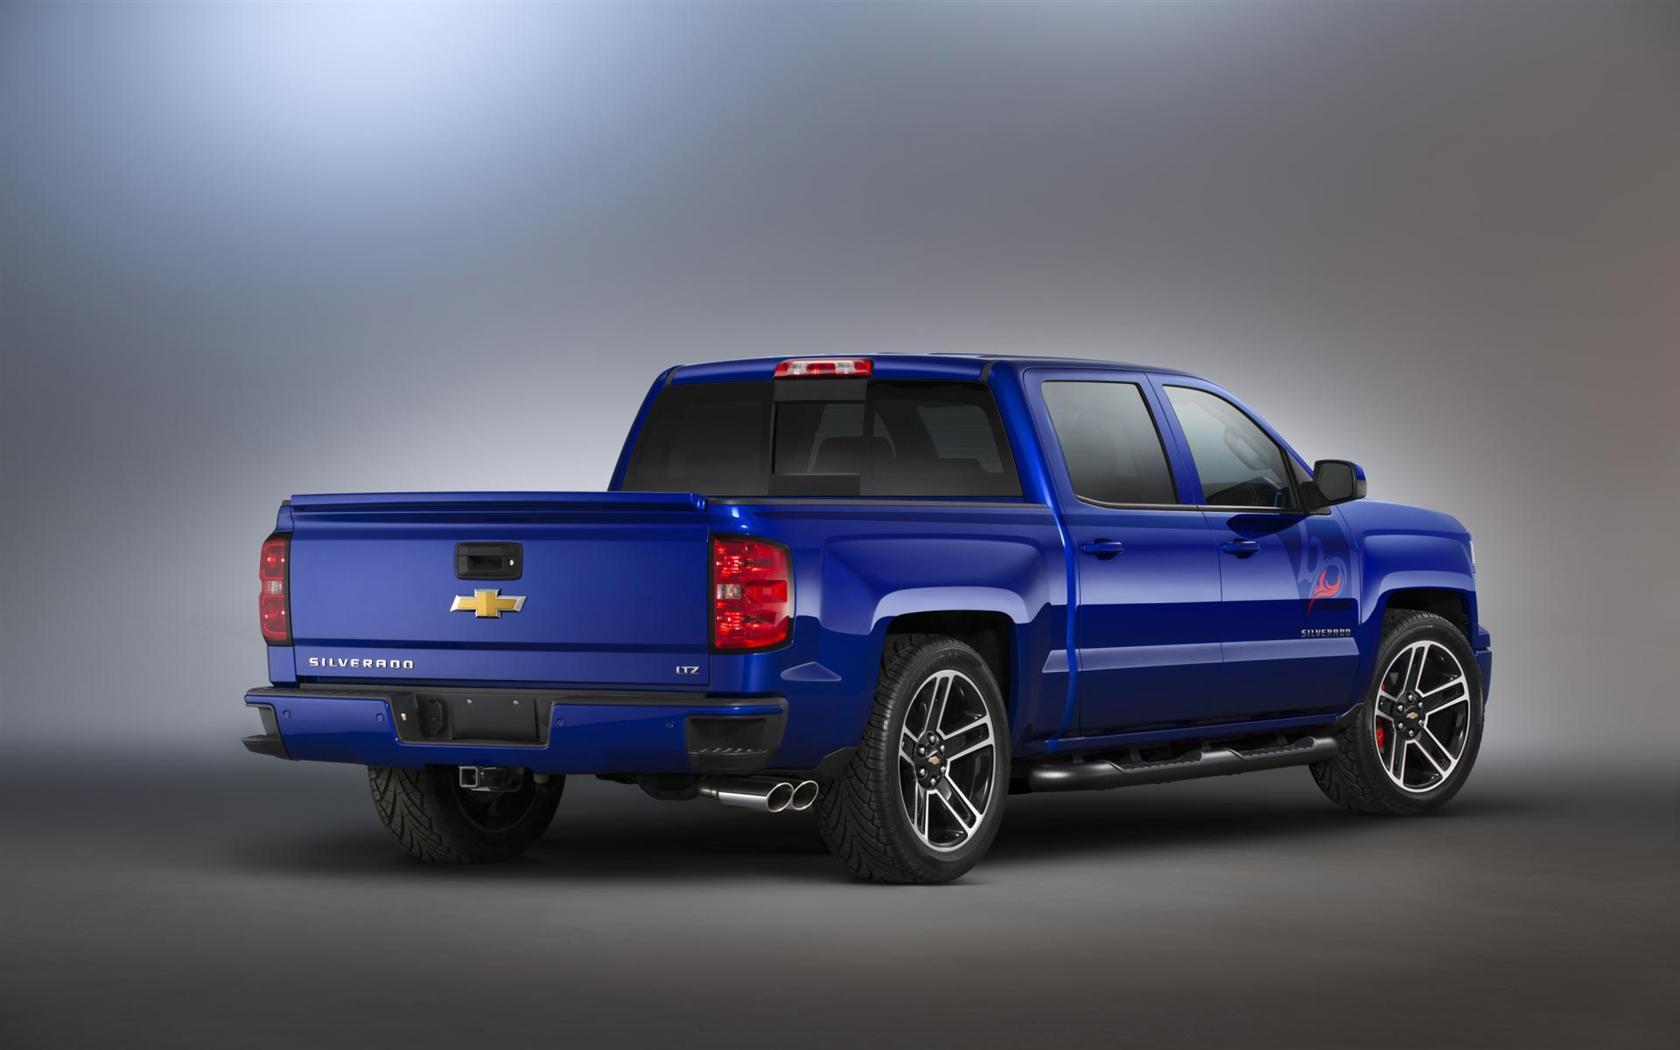 2013 Chevrolet Brad Paisley Signature Silverado